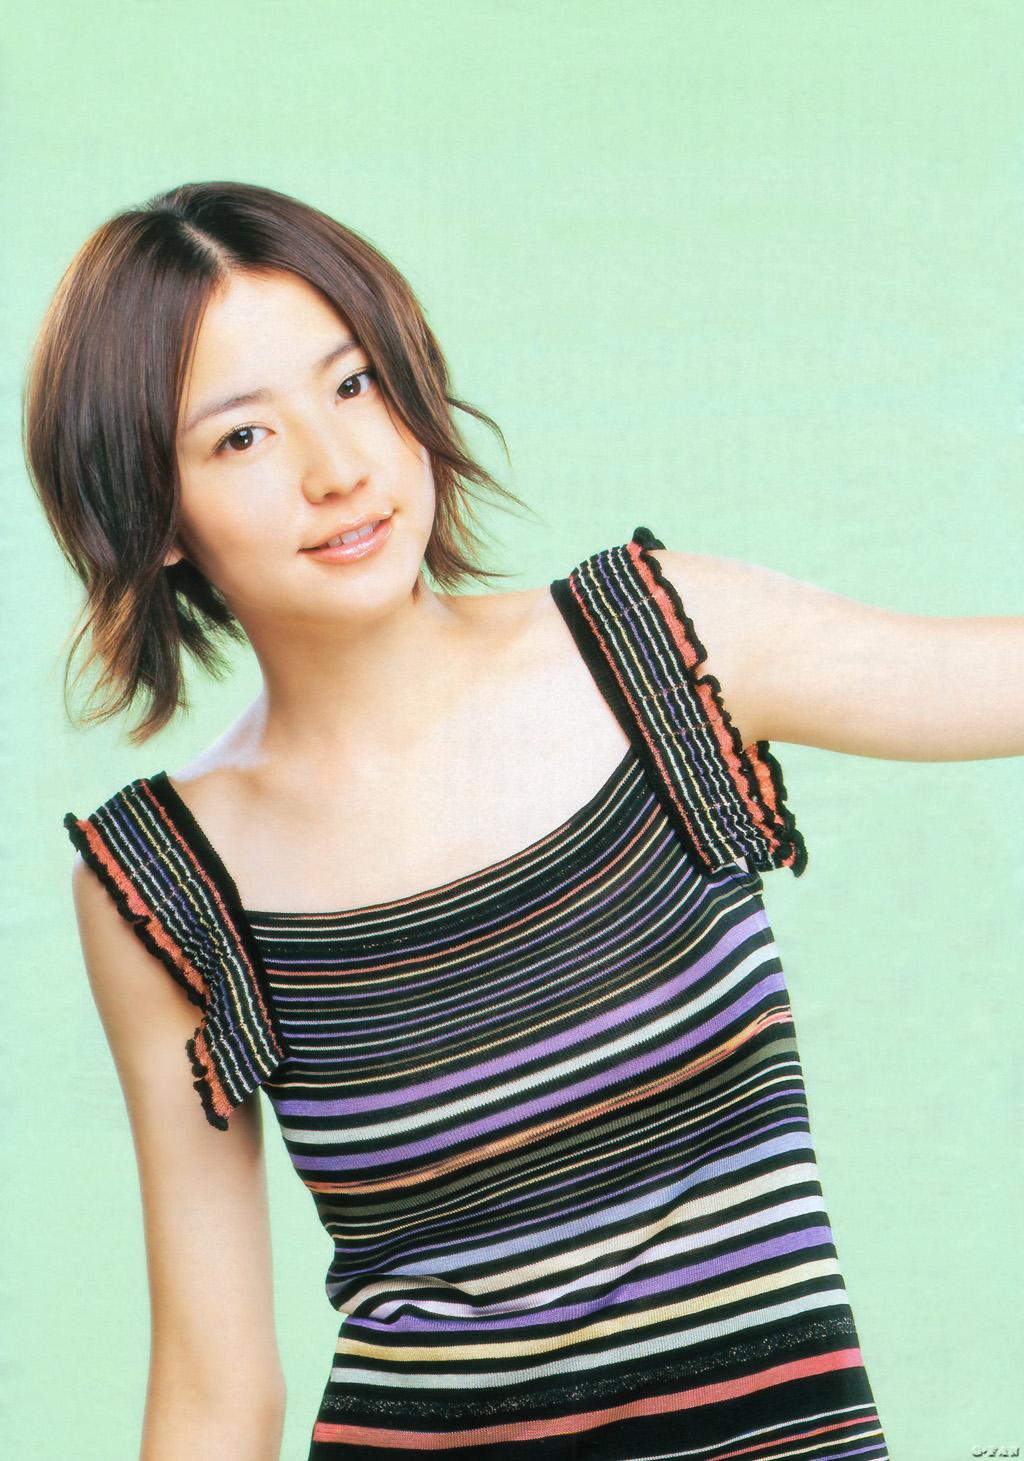 http://2.bp.blogspot.com/-Hu7O2vbsO0M/T-wlZRtVvrI/AAAAAAAAGro/X_dGL23gO7Y/s1600/Masami_Nagasawa_hot_wallpapwes.jpg